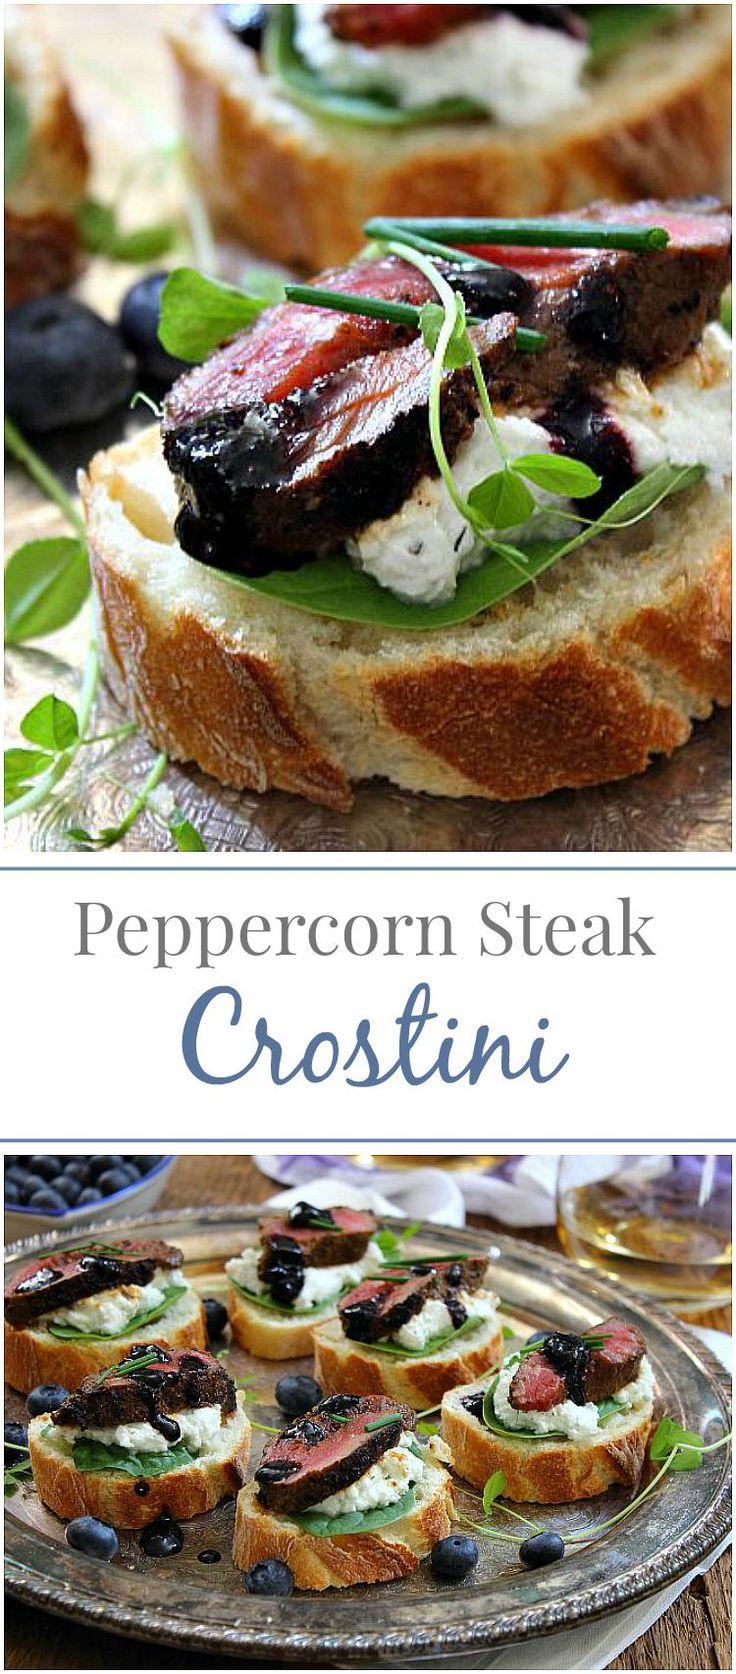 Peppercorn Steak Crostini with Blueberry Balsamic Glaze | Simply Fresh Dinners